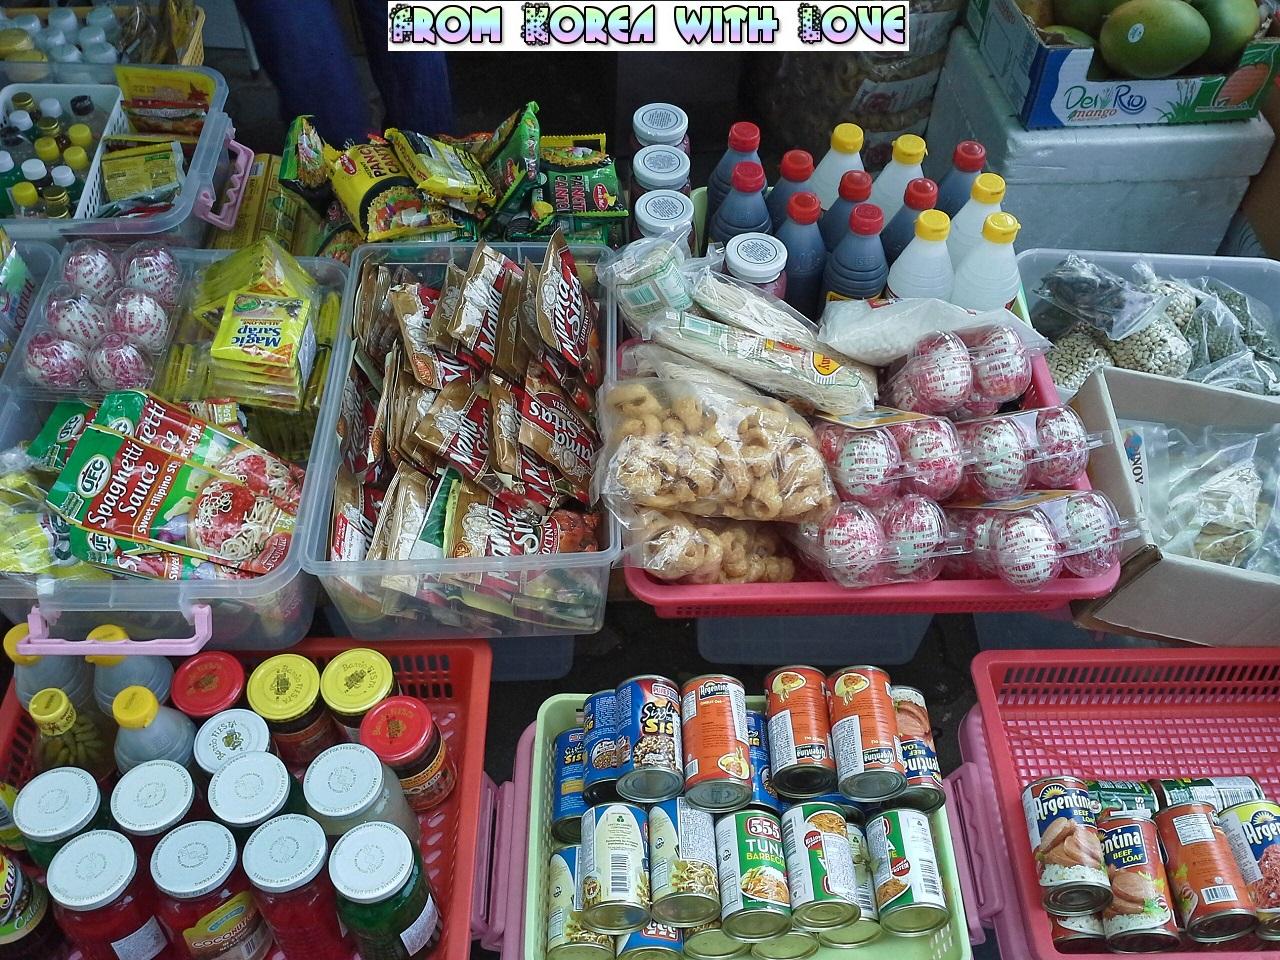 Filipino Food From Korea With Love